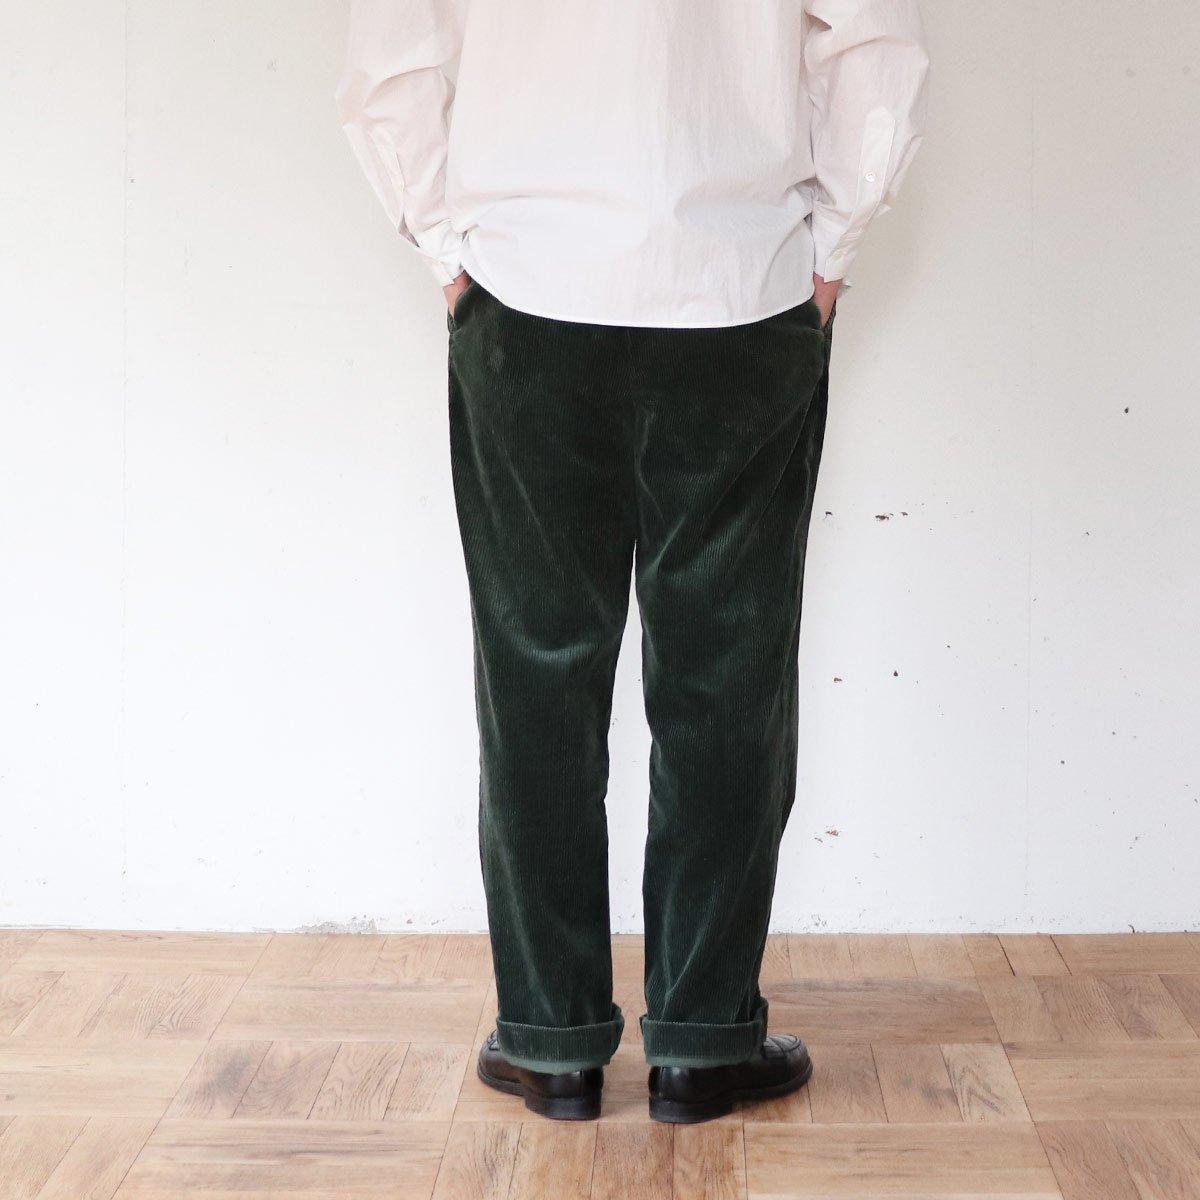 POLO RALPH LAUREN CORDUROY PANTS 詳細画像7